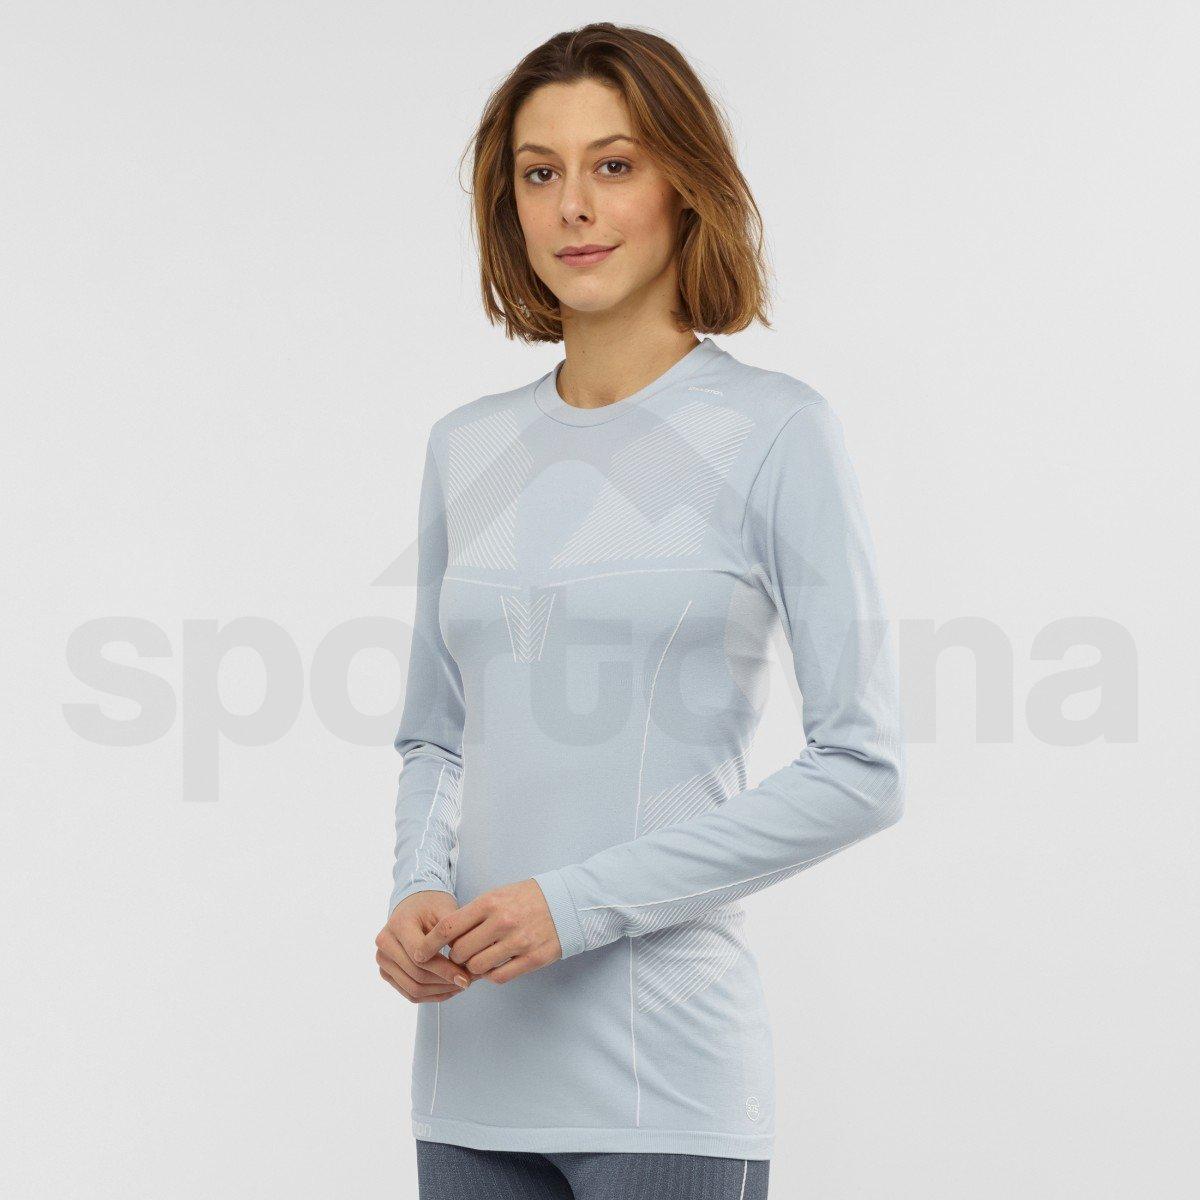 Termo tričko Salomon PRIMO WARM SEAMLESS Tee W - světle modrá